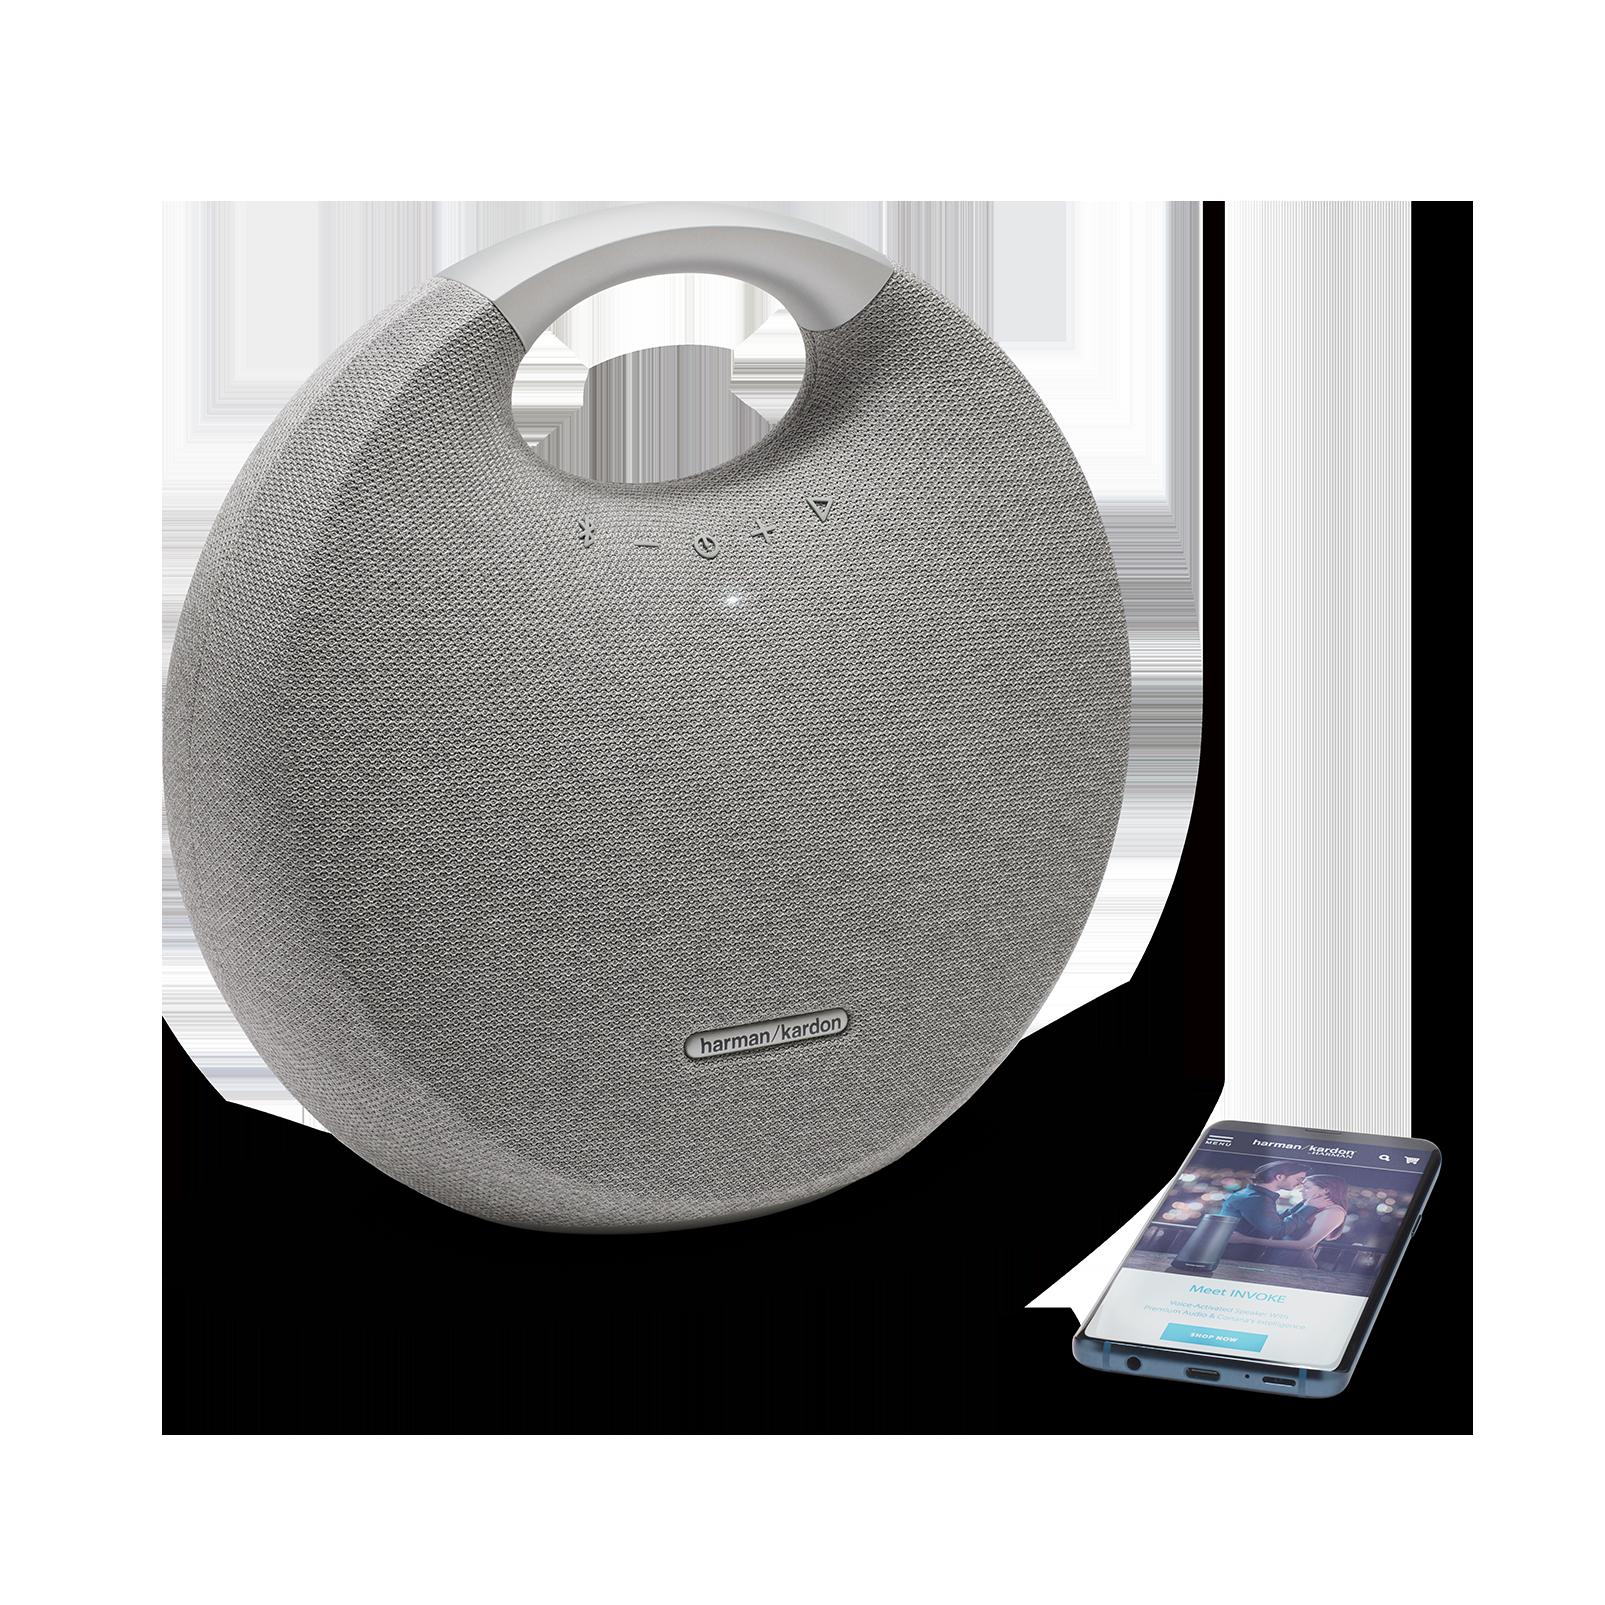 Onyx Studio 5 - Grey - Portable Bluetooth Speaker - Detailshot 1